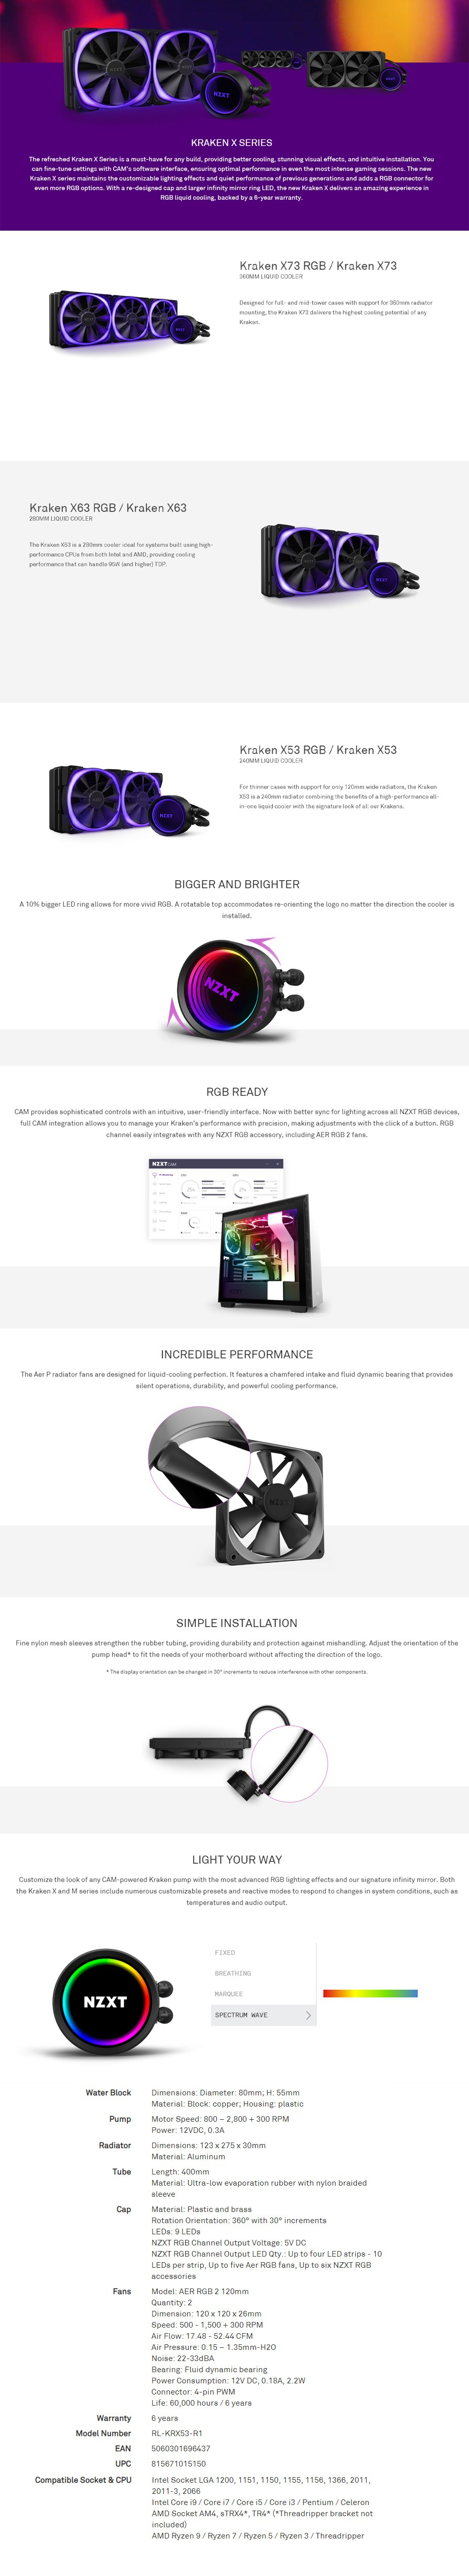 NZXT Kraken X53 240mm RGB AIO Liquid CPU Cooler - Overview 1